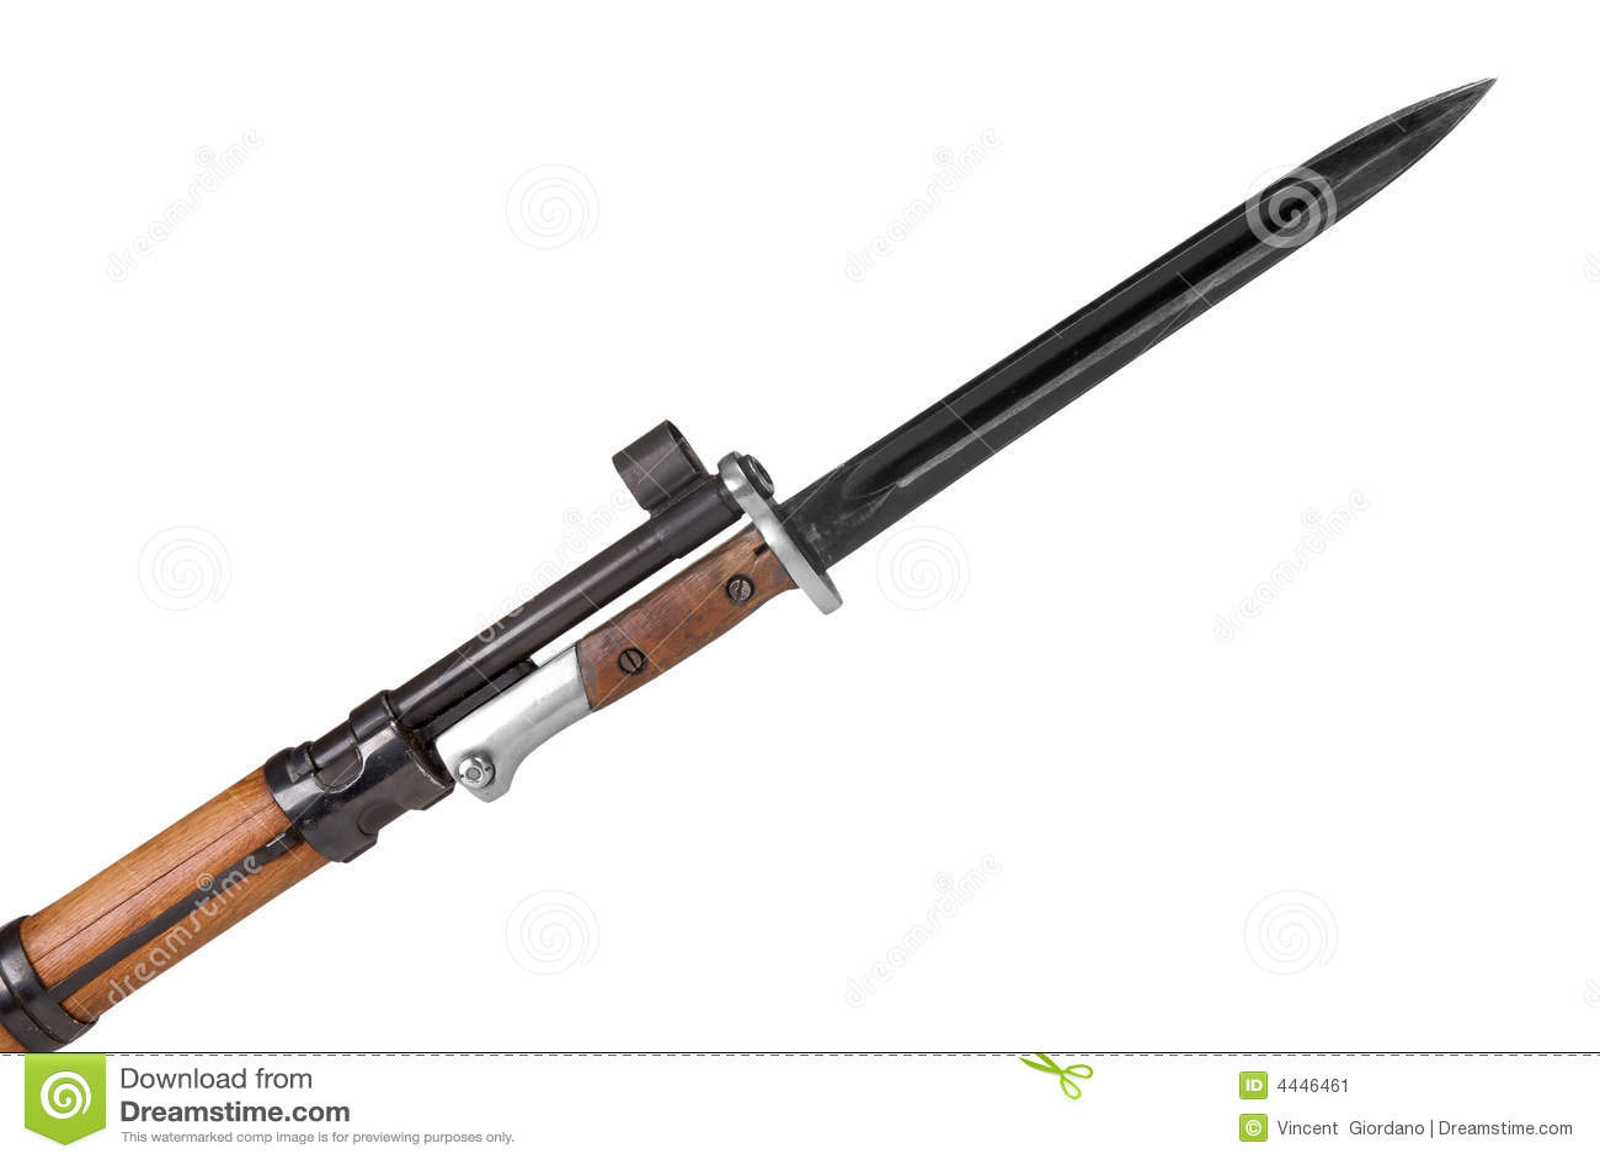 Military Rifle with bayonet